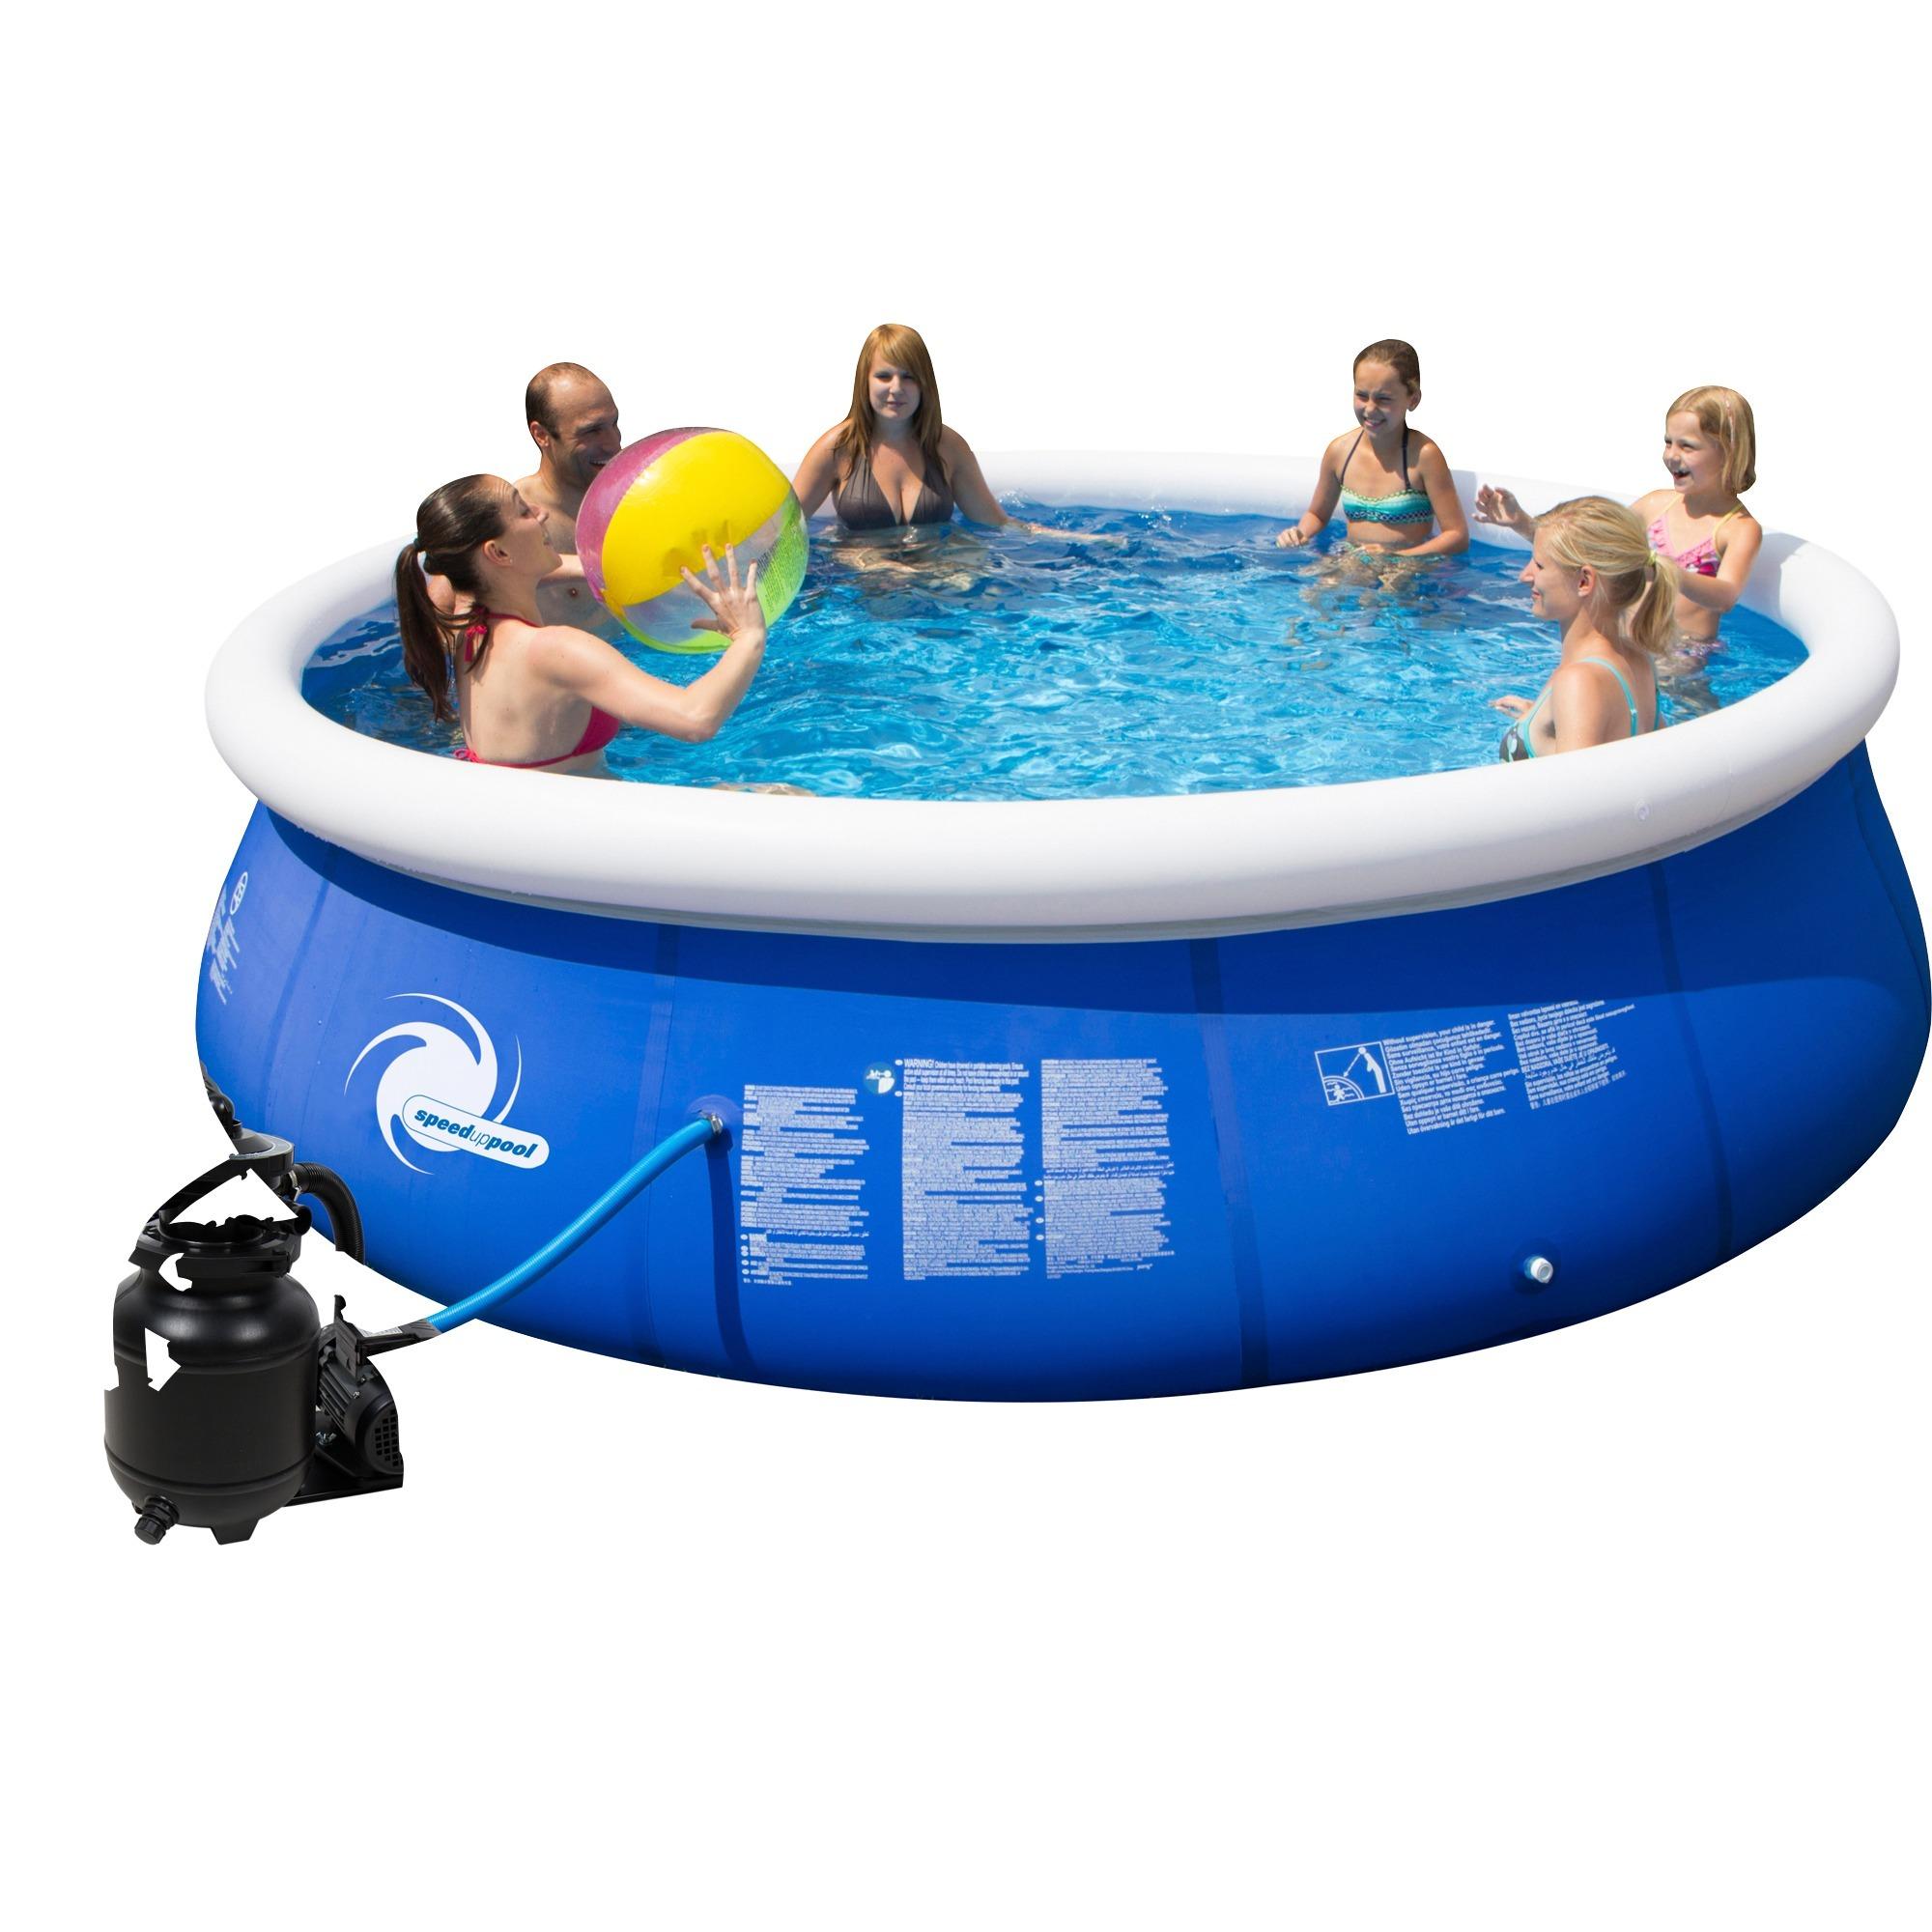 speed-up-pool-10015-swimming-pool